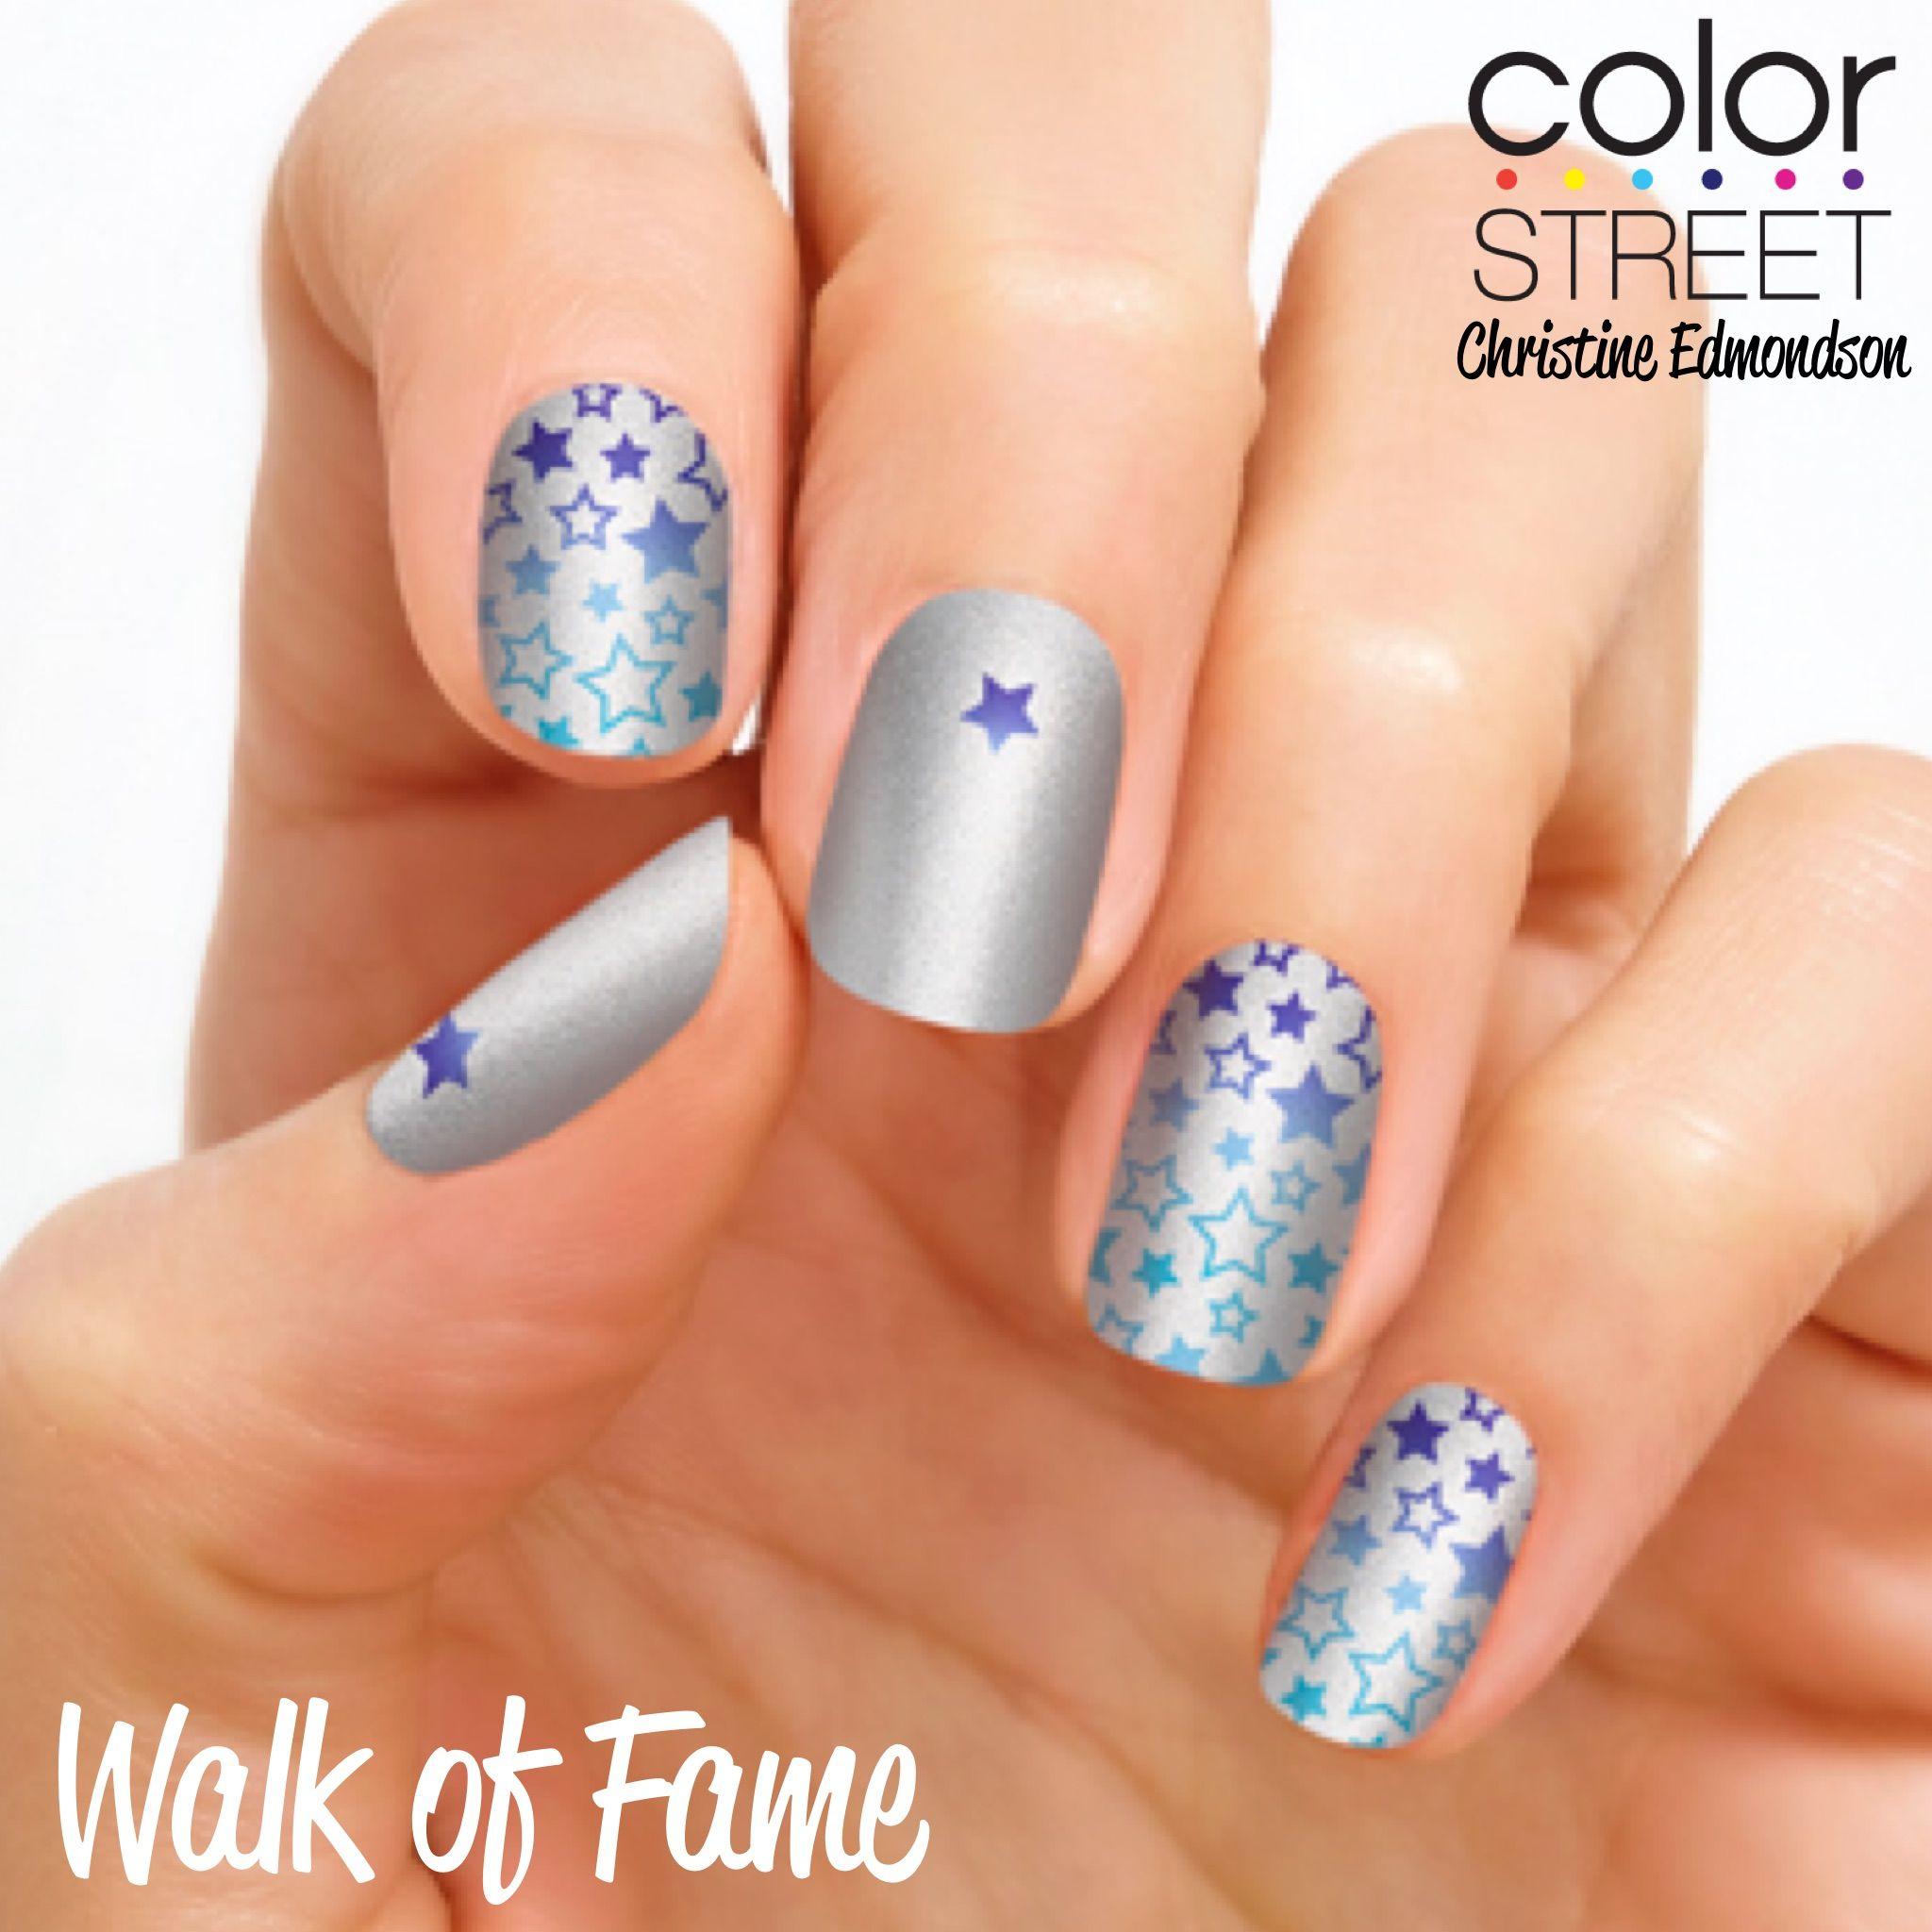 Walk of Fame - 100% nail polish strips that require NO tools, NO ...